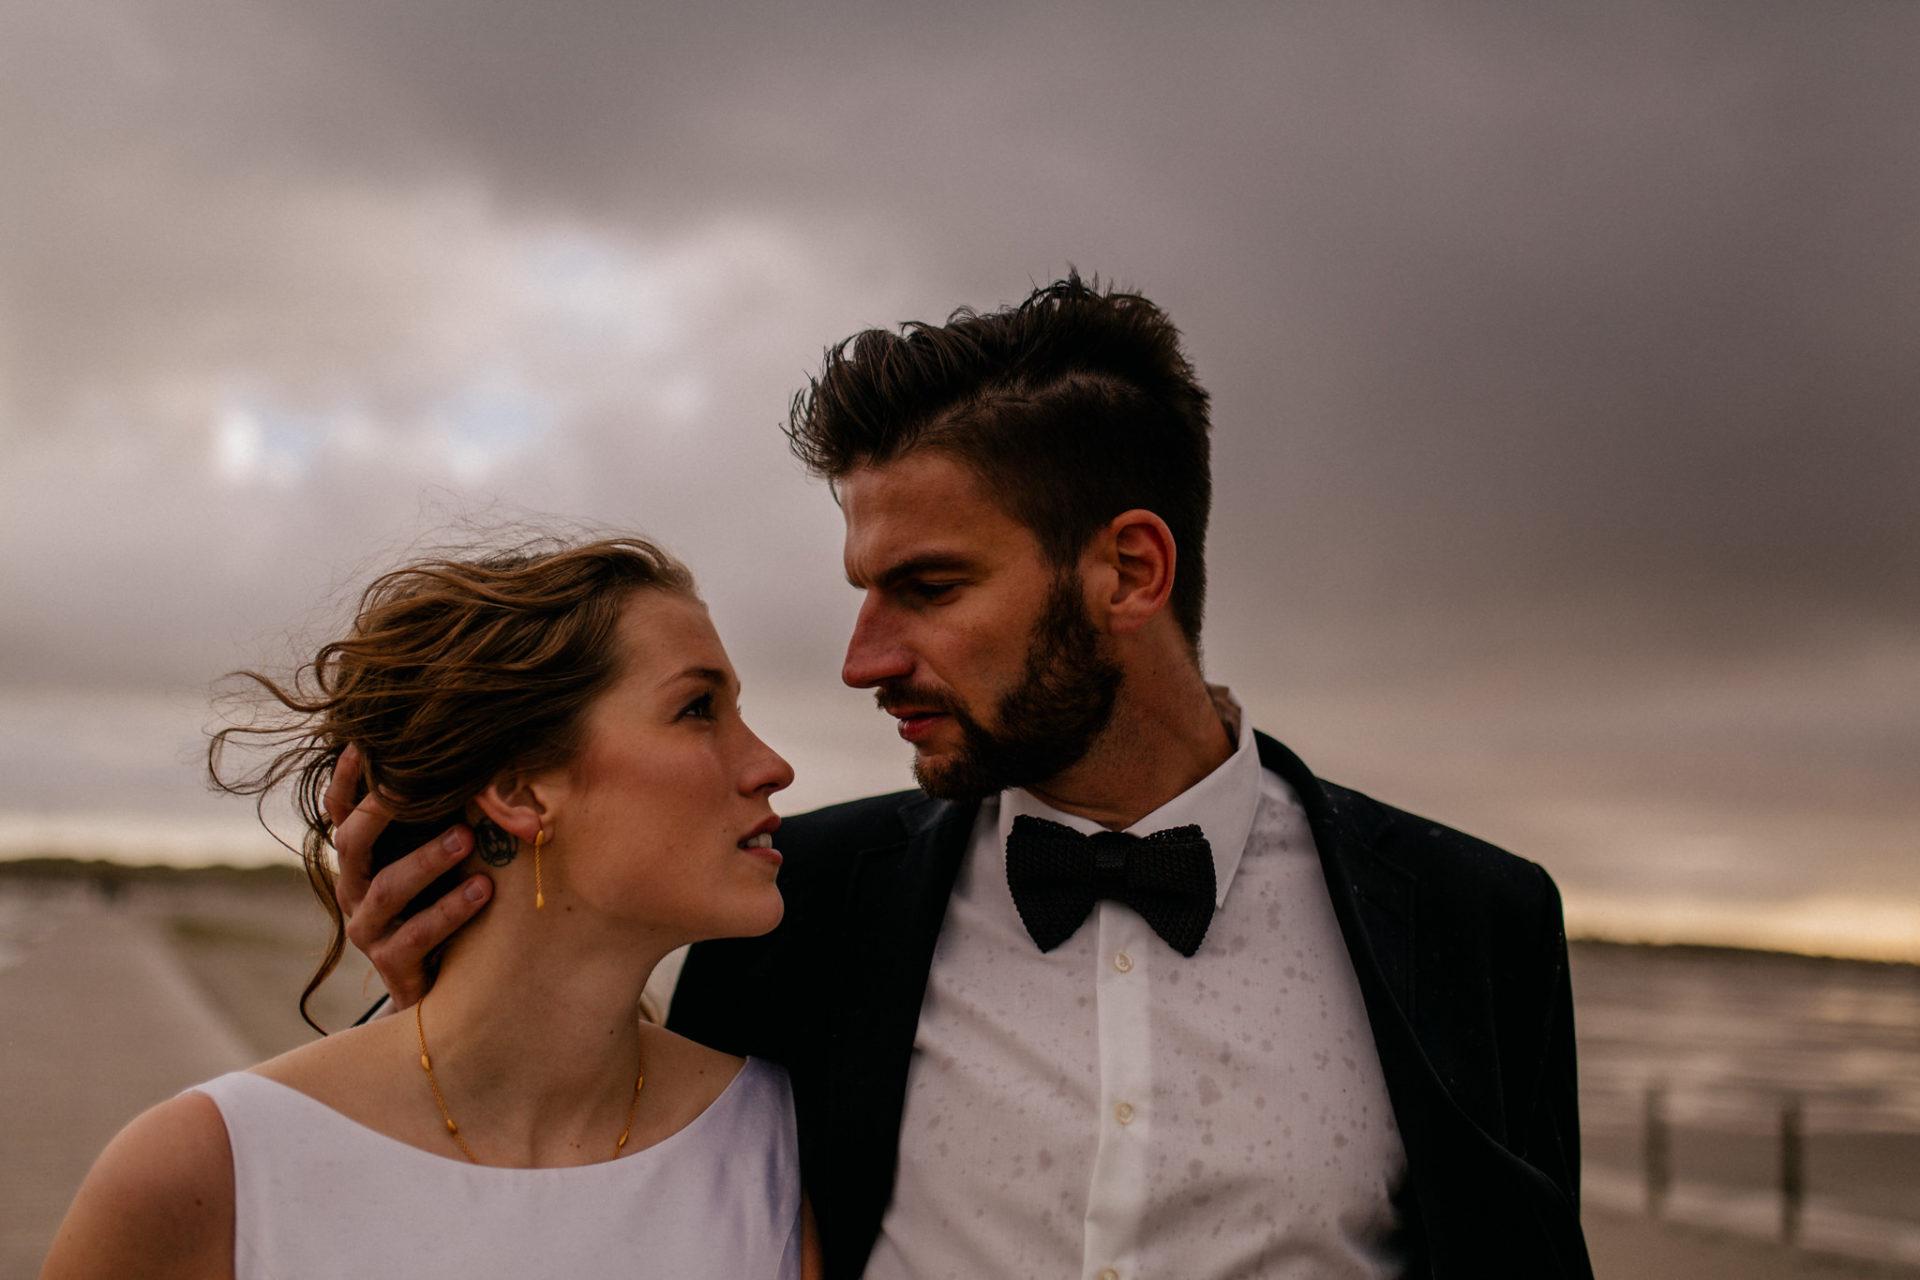 sank peter wording wedding photographer-beach wedding germany thunderstorm-couple portrait-elfenkleid dress